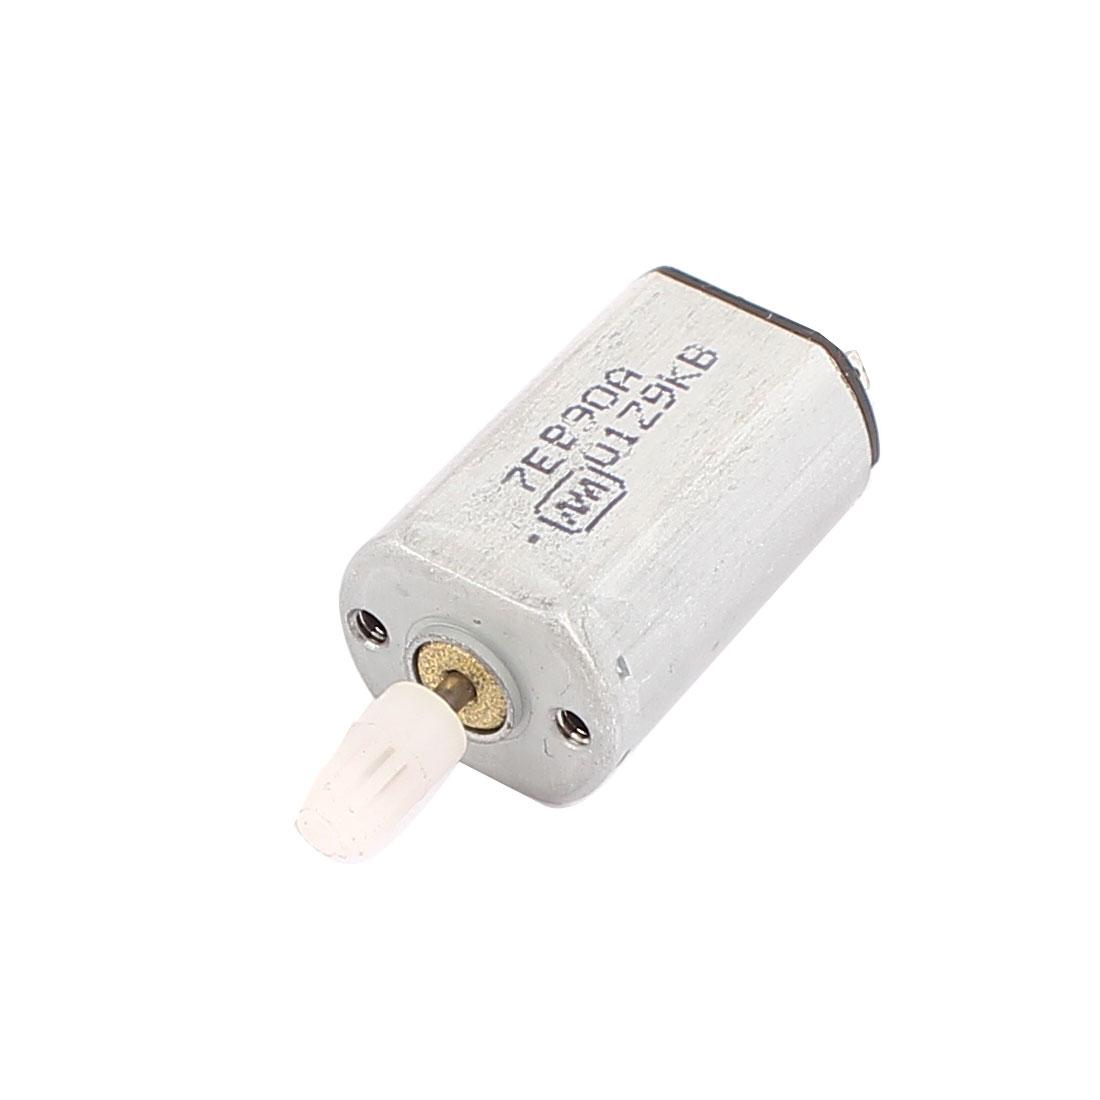 FF-N20 3V 25000RPM 1mm Shaft Diameter DIY Miniature Magnet DC Motor